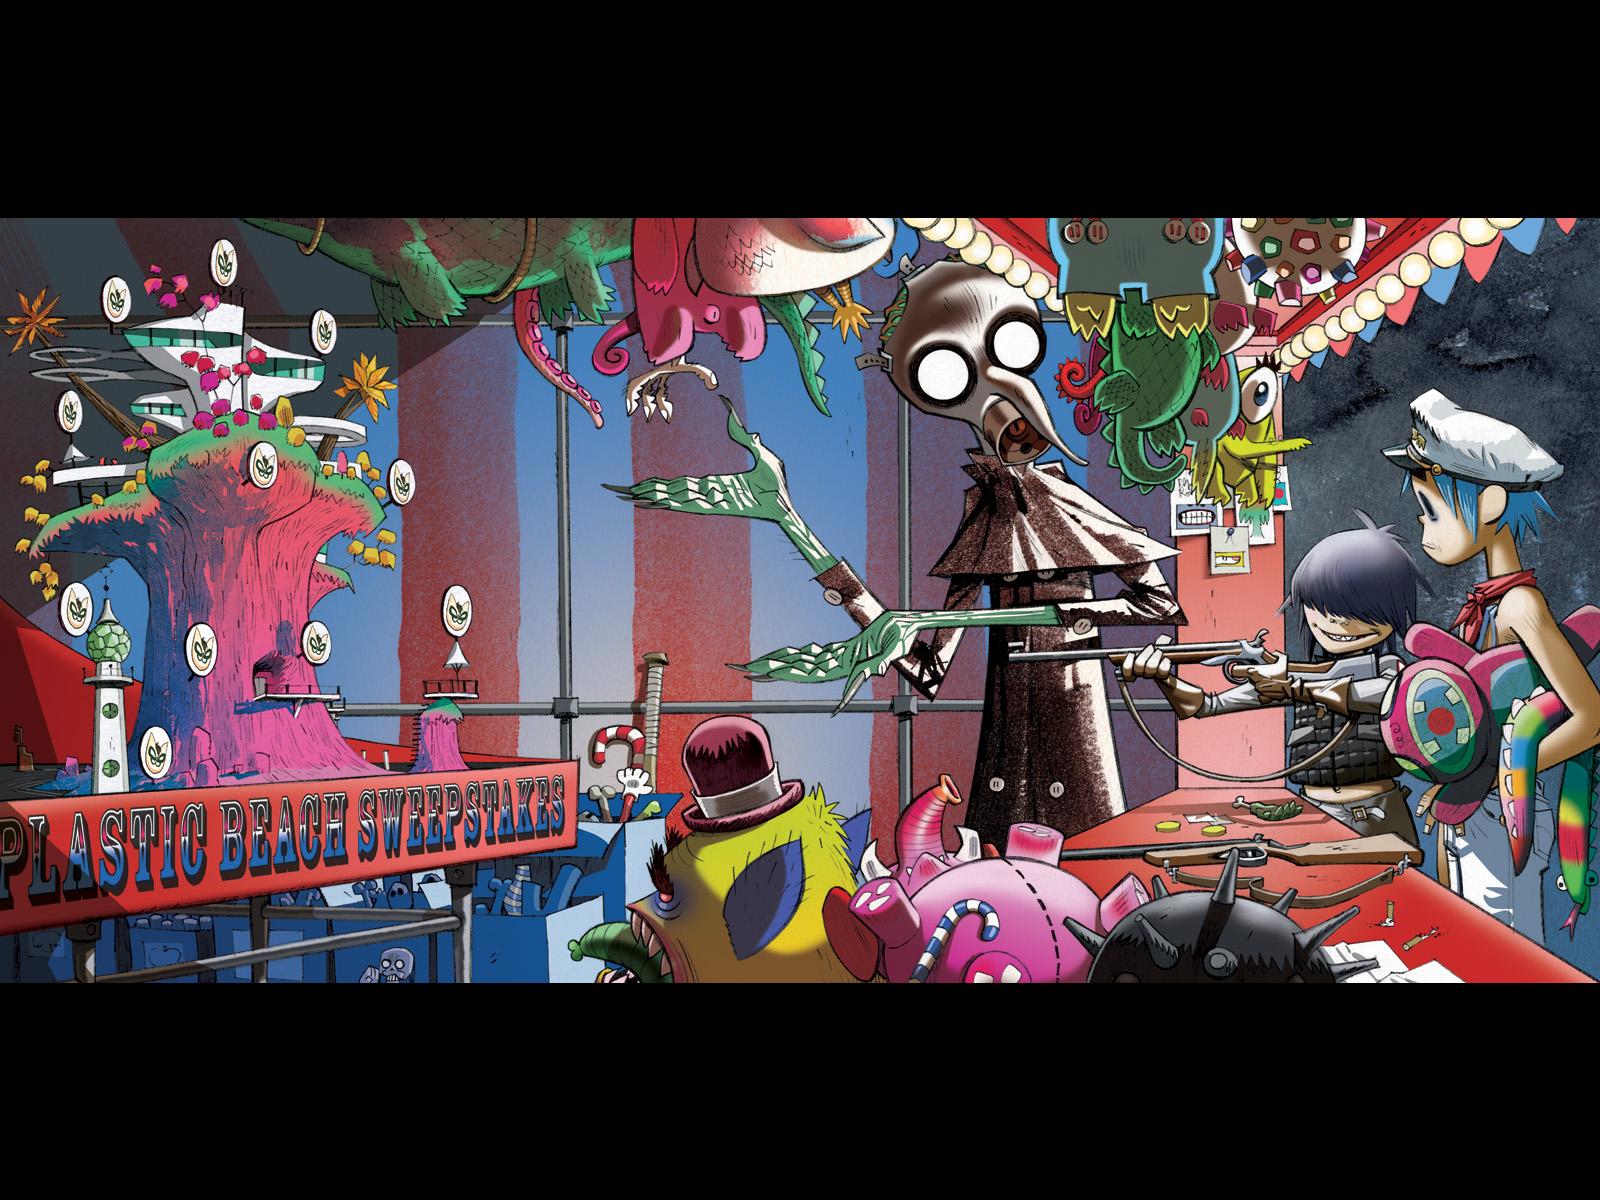 Gorillaz Wallpaper And Background Image Cyborg Noodle Y 2d